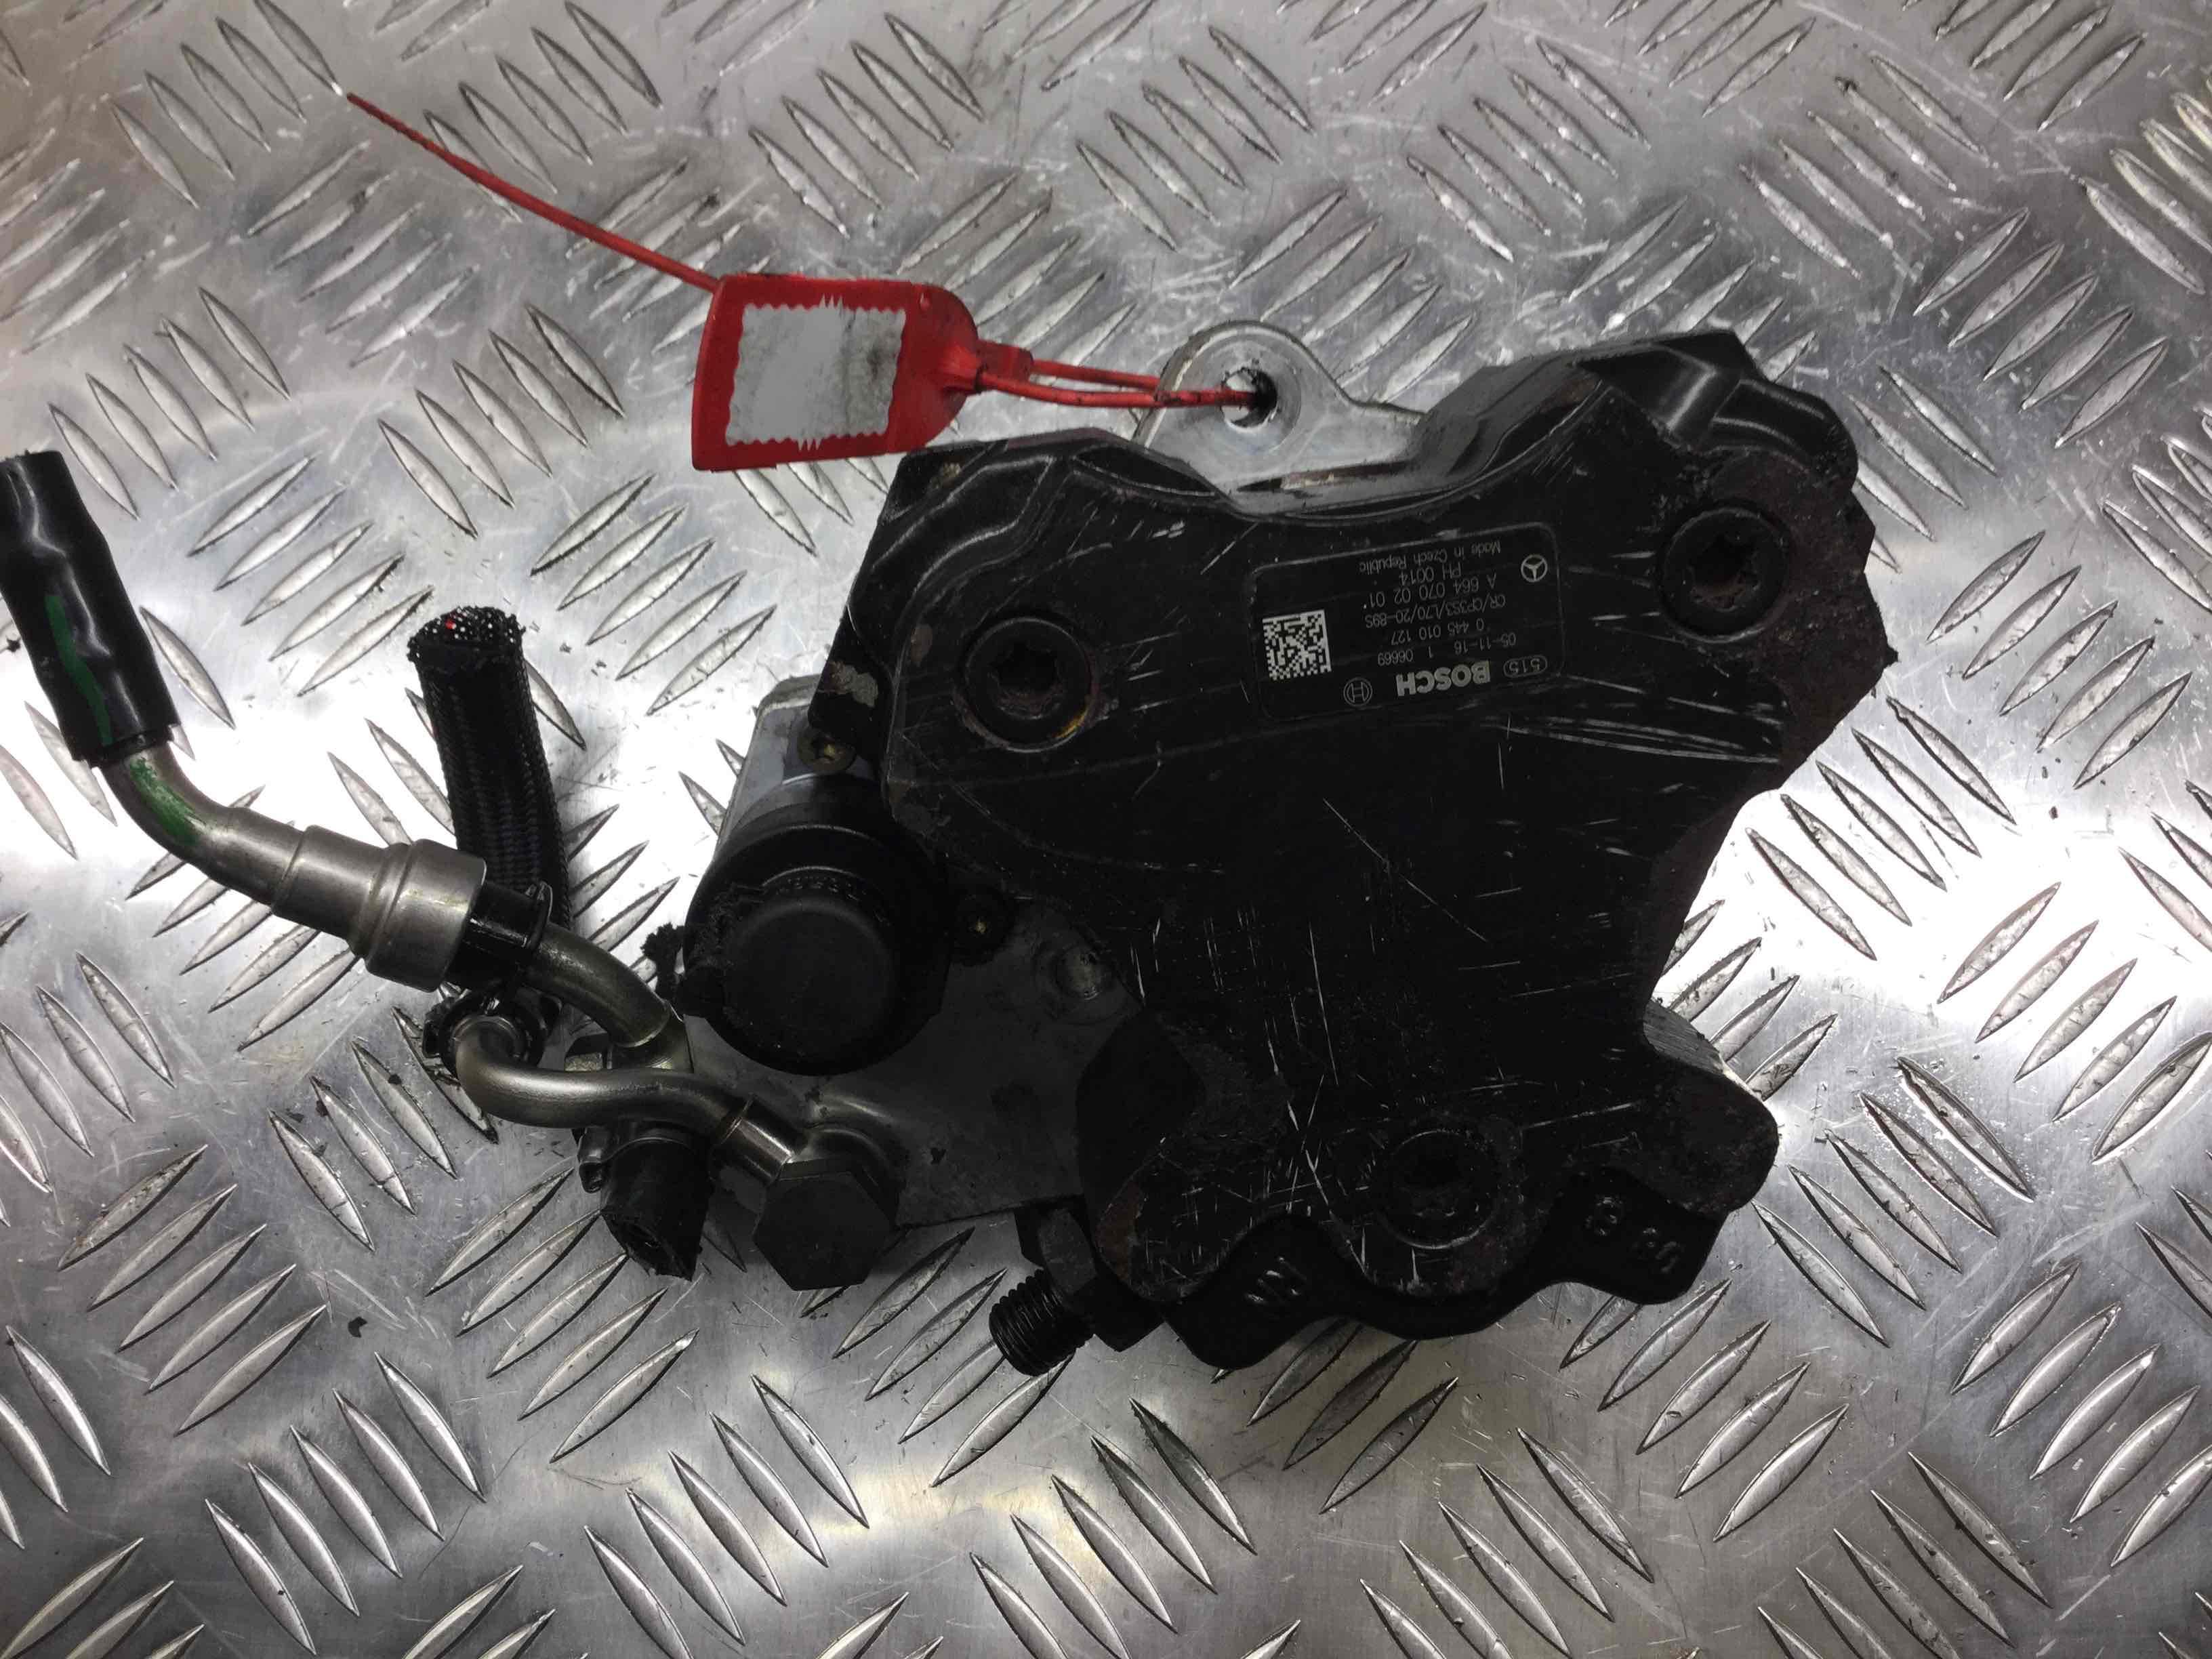 Фото 'Chrysler PTCruiser ТНВД a6640700201;  0445010127;  0445010344;  0986437326;  0986437362;  6640700001;  6640700201;  A6640700001;  A6640700201 '